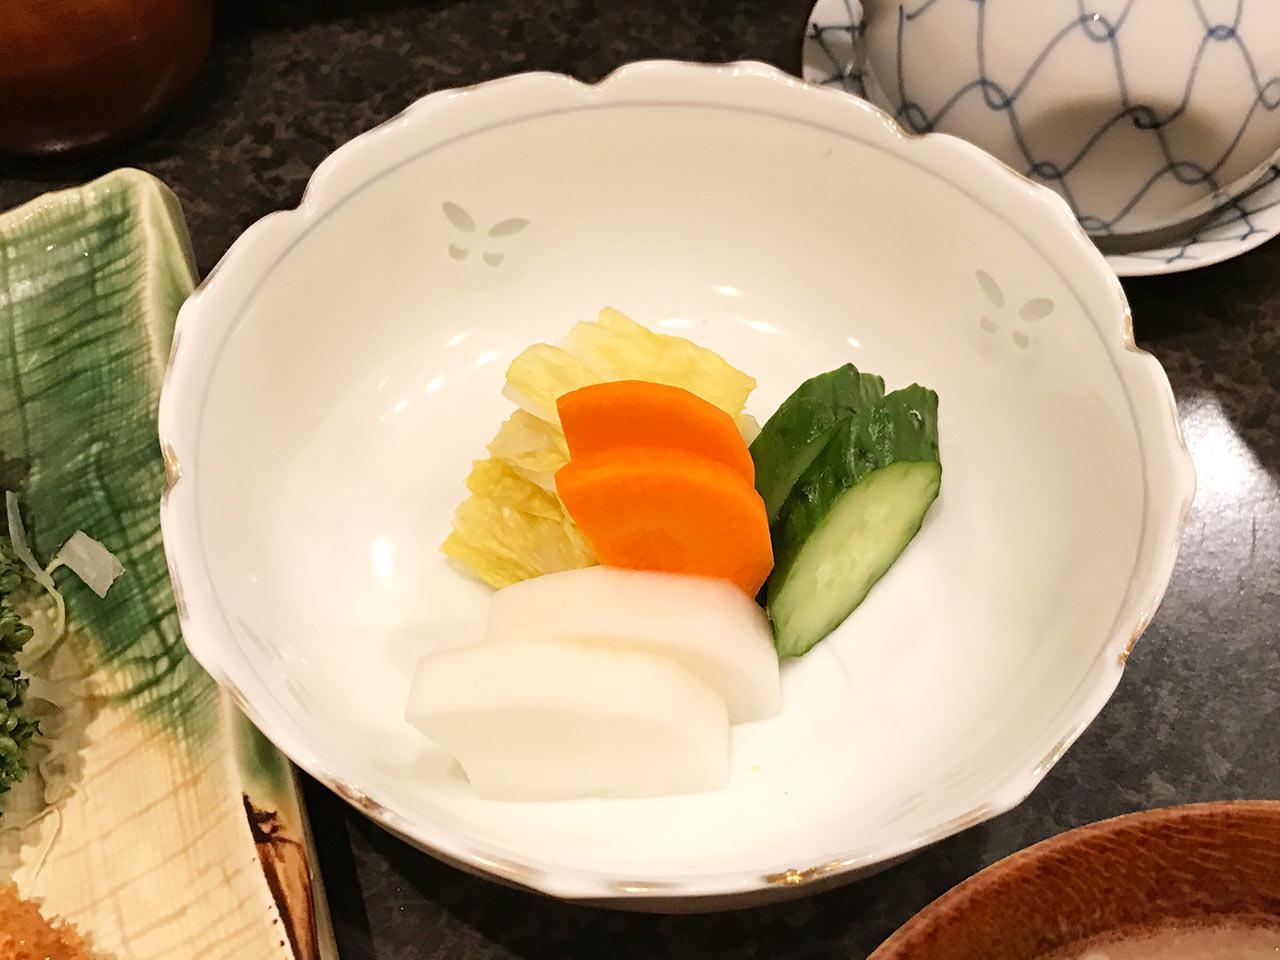 kawasaki-ton-q-side02